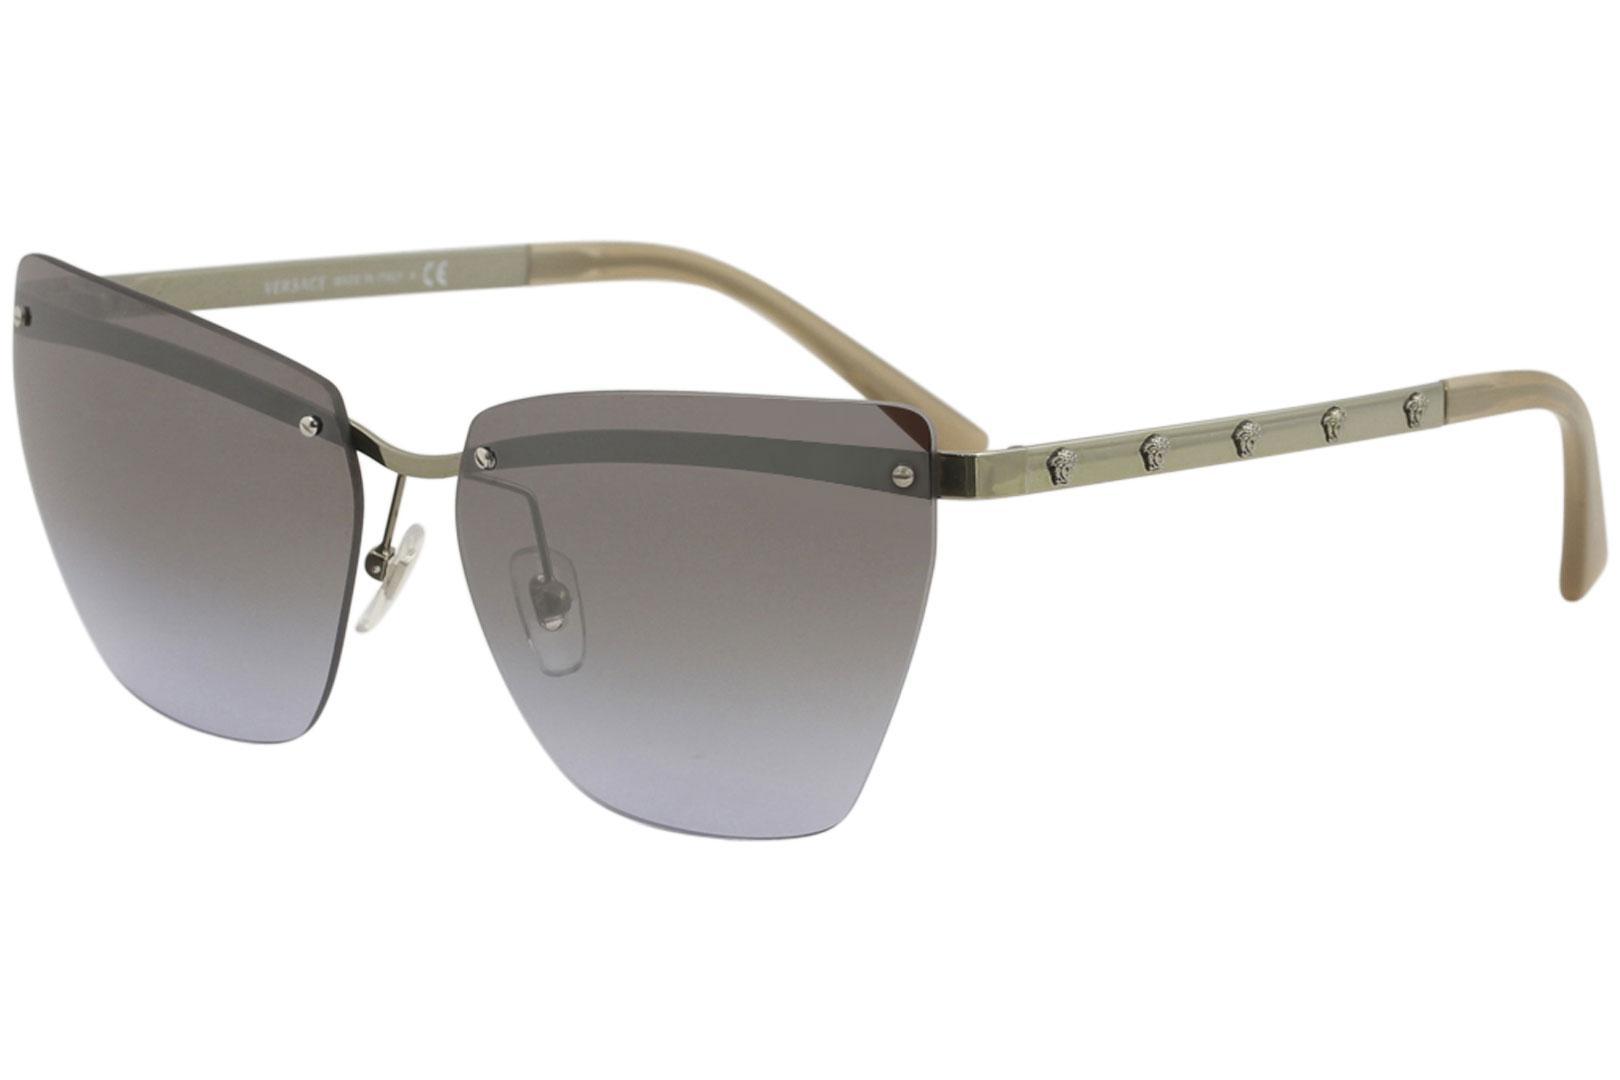 e65f601a67ec Versace Women s VE2190 VE 2190 Fashion Cat Eye Sunglasses